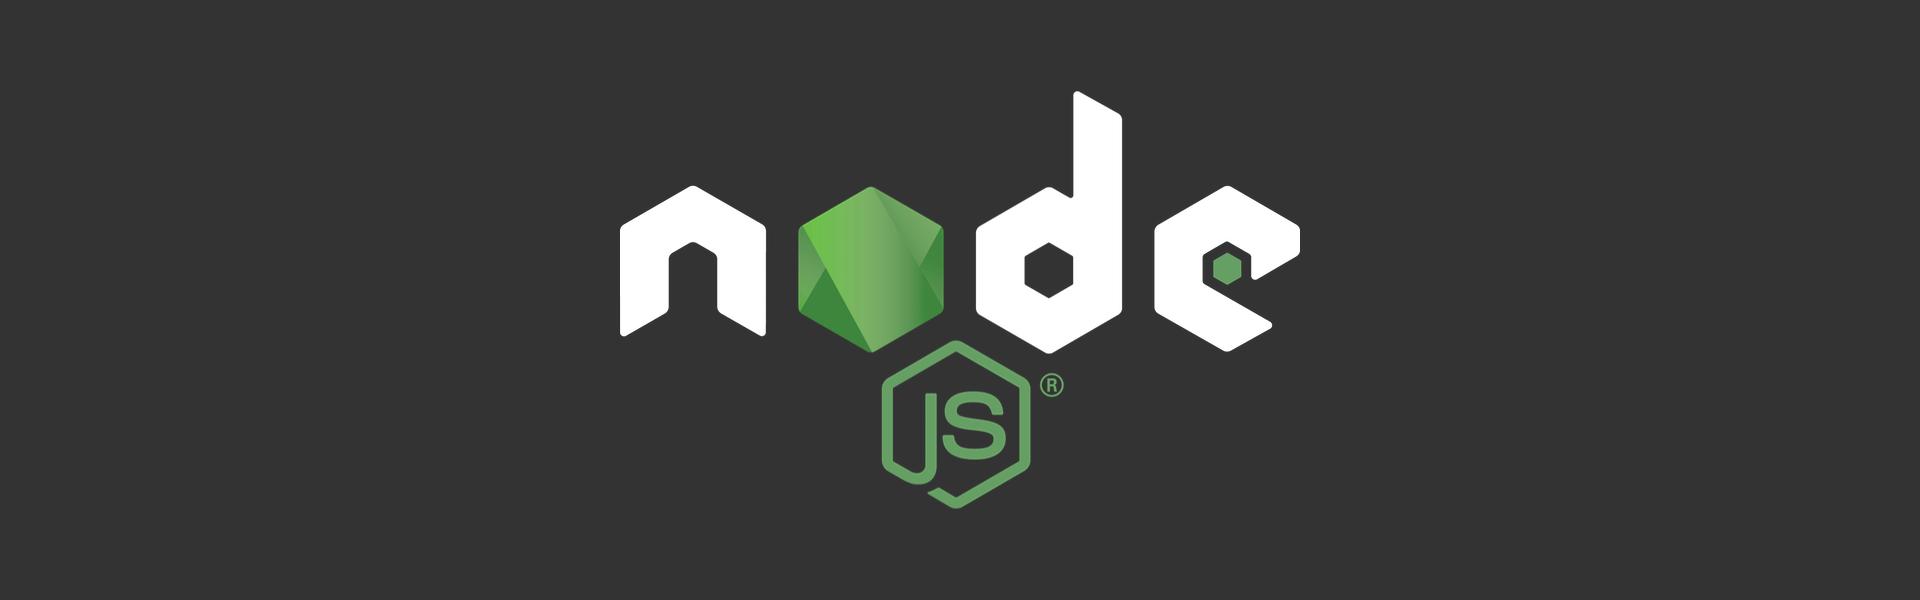 /how-to-start-a-node-js-project-881d811bdcf4 feature image